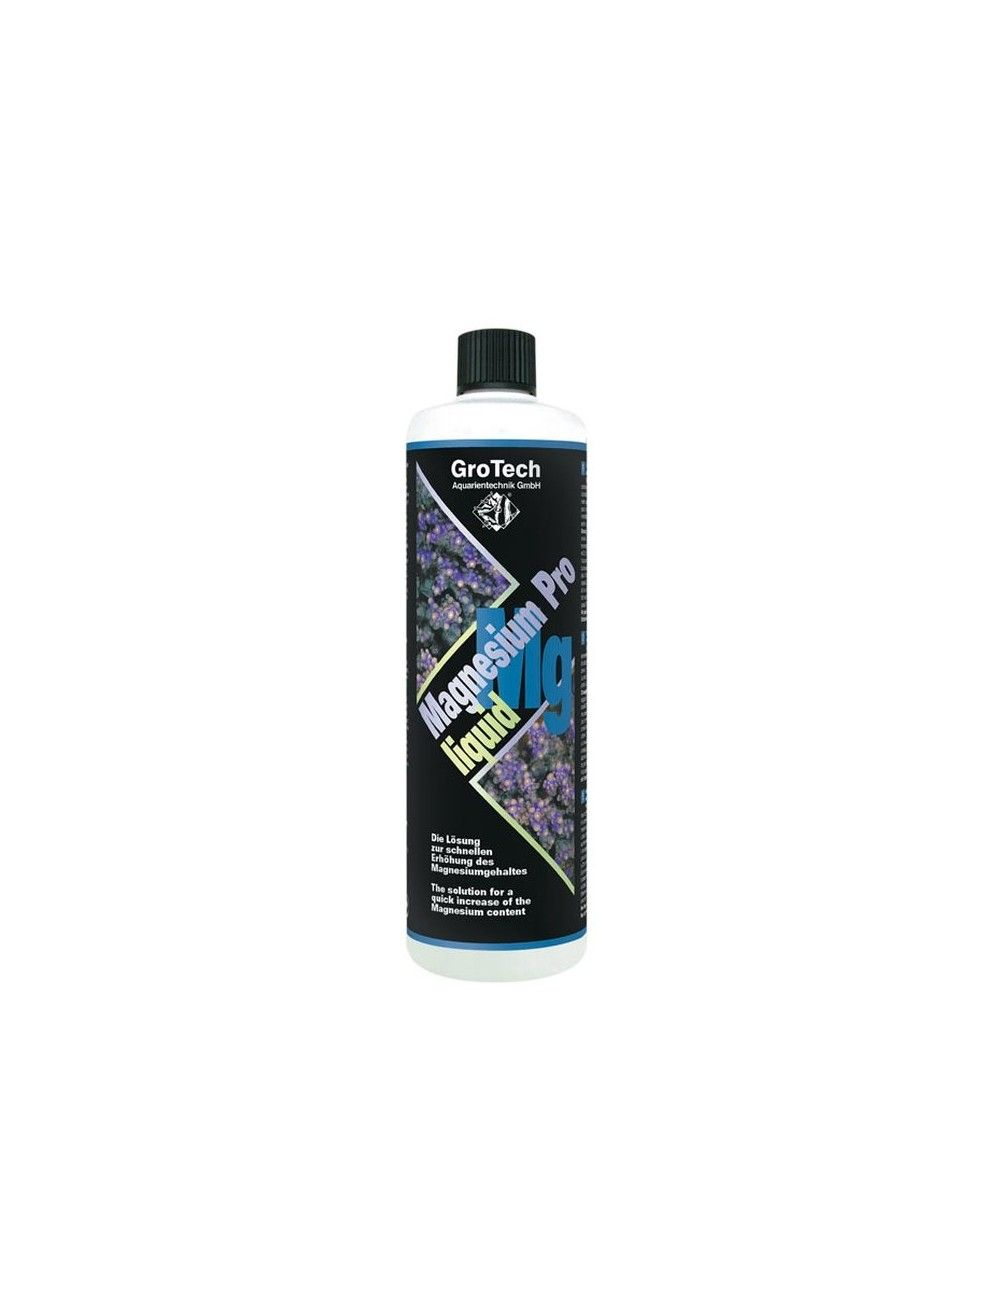 GROTECH - Magnesium Pro Liquid - 1000ml - Magnésium pour aquarium d'eau de mer